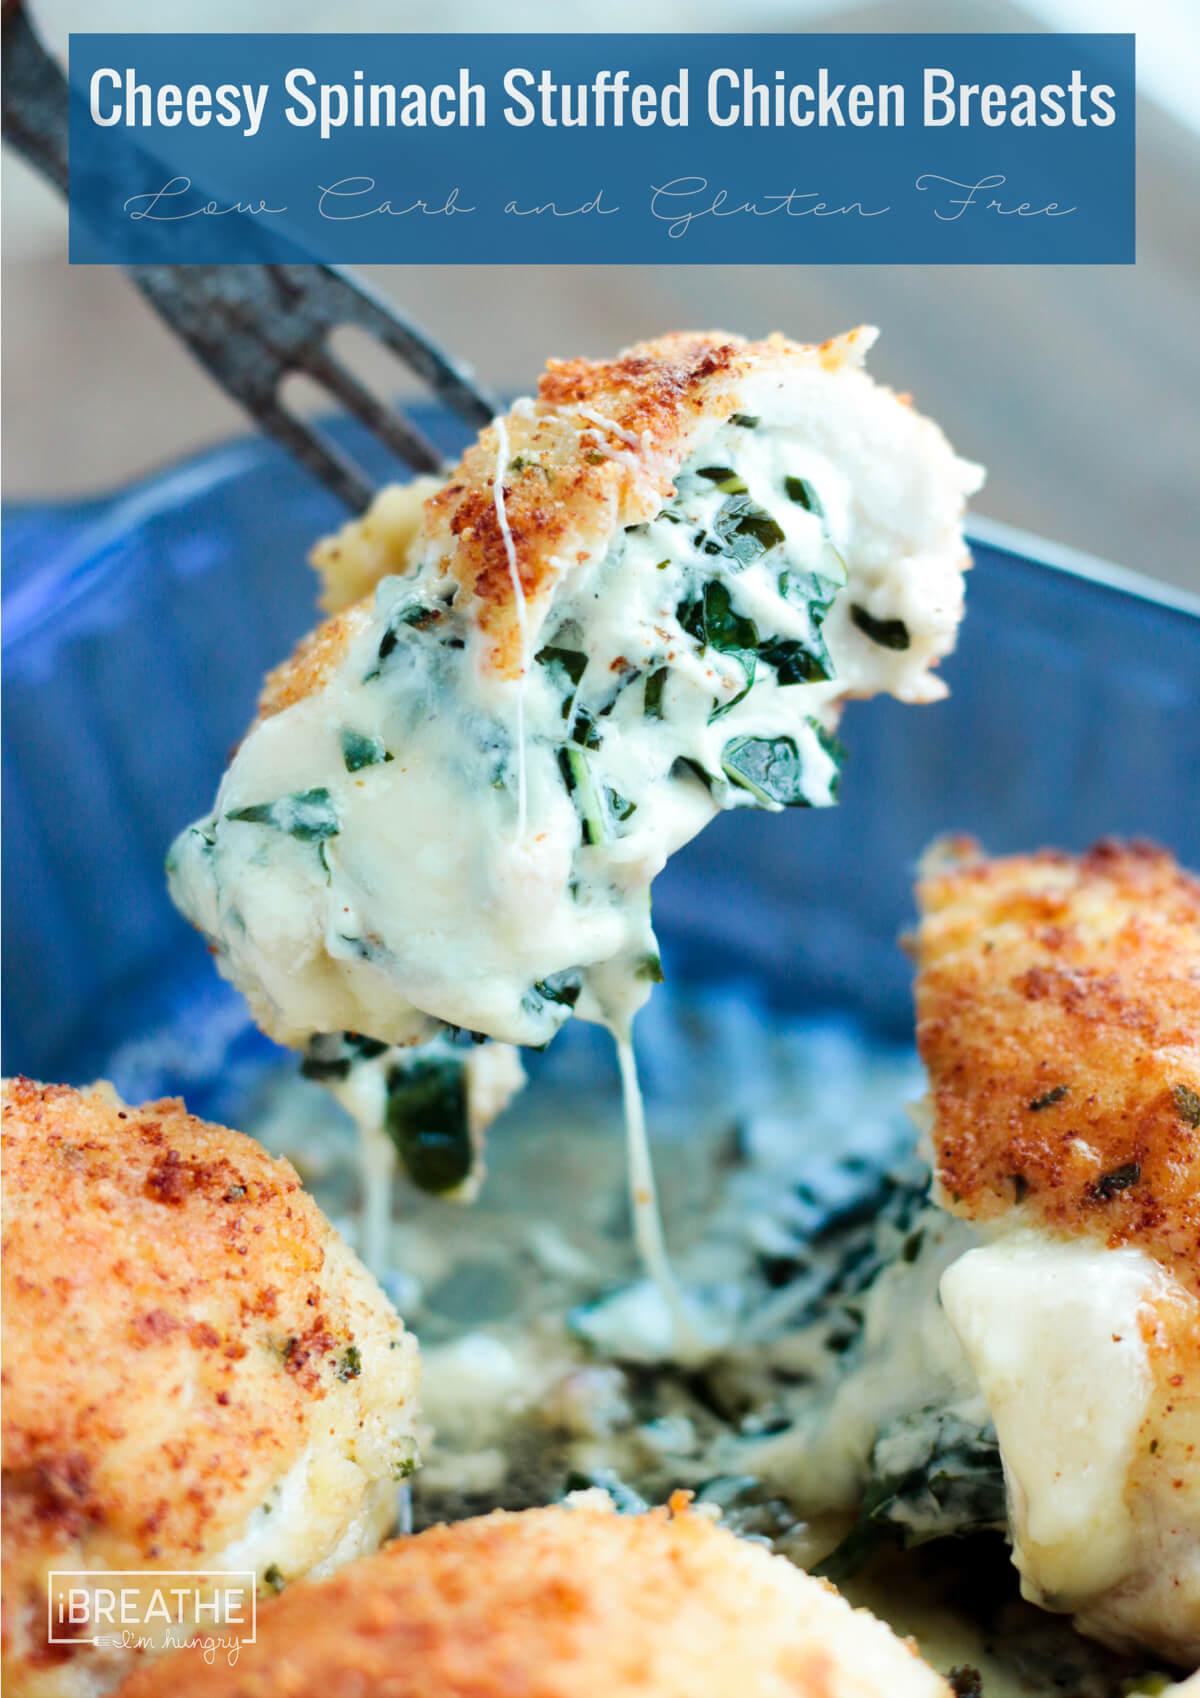 Keto Cheesy Spinach Stuffed Chicken Breasts